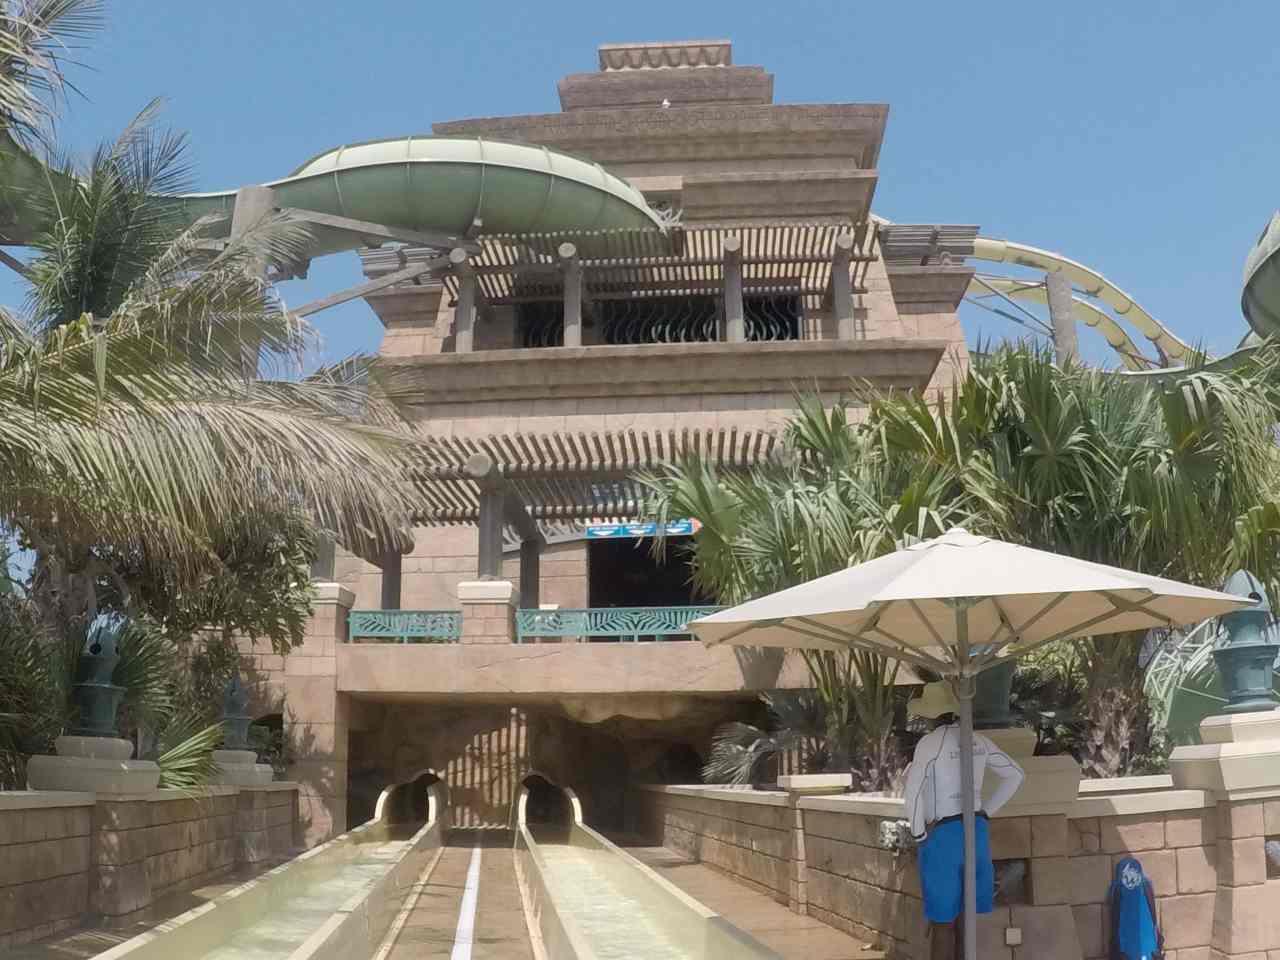 Aquaventure waterpark Atlantis Dubai Poseidon's Tower